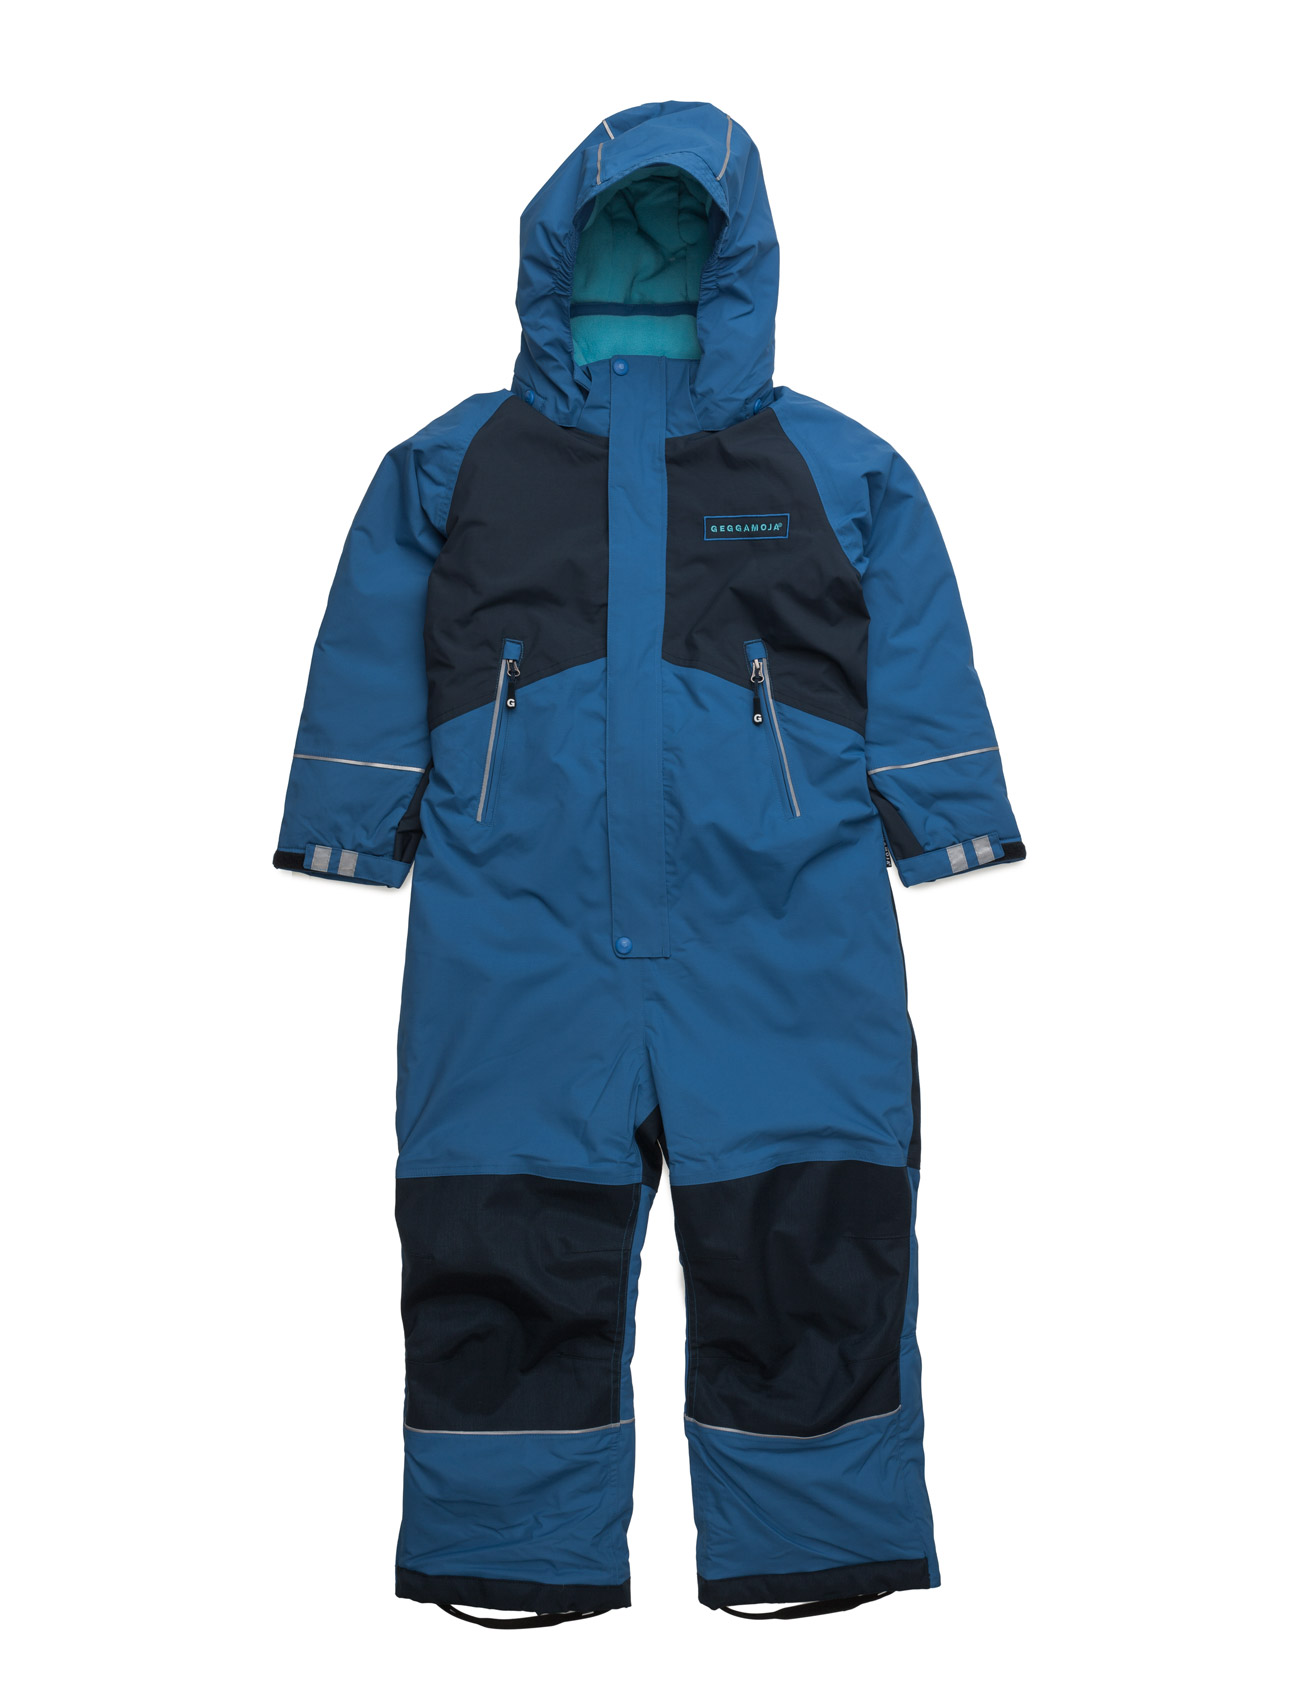 Winter Overall Geggamoja Overalls til Børn i Navy blå